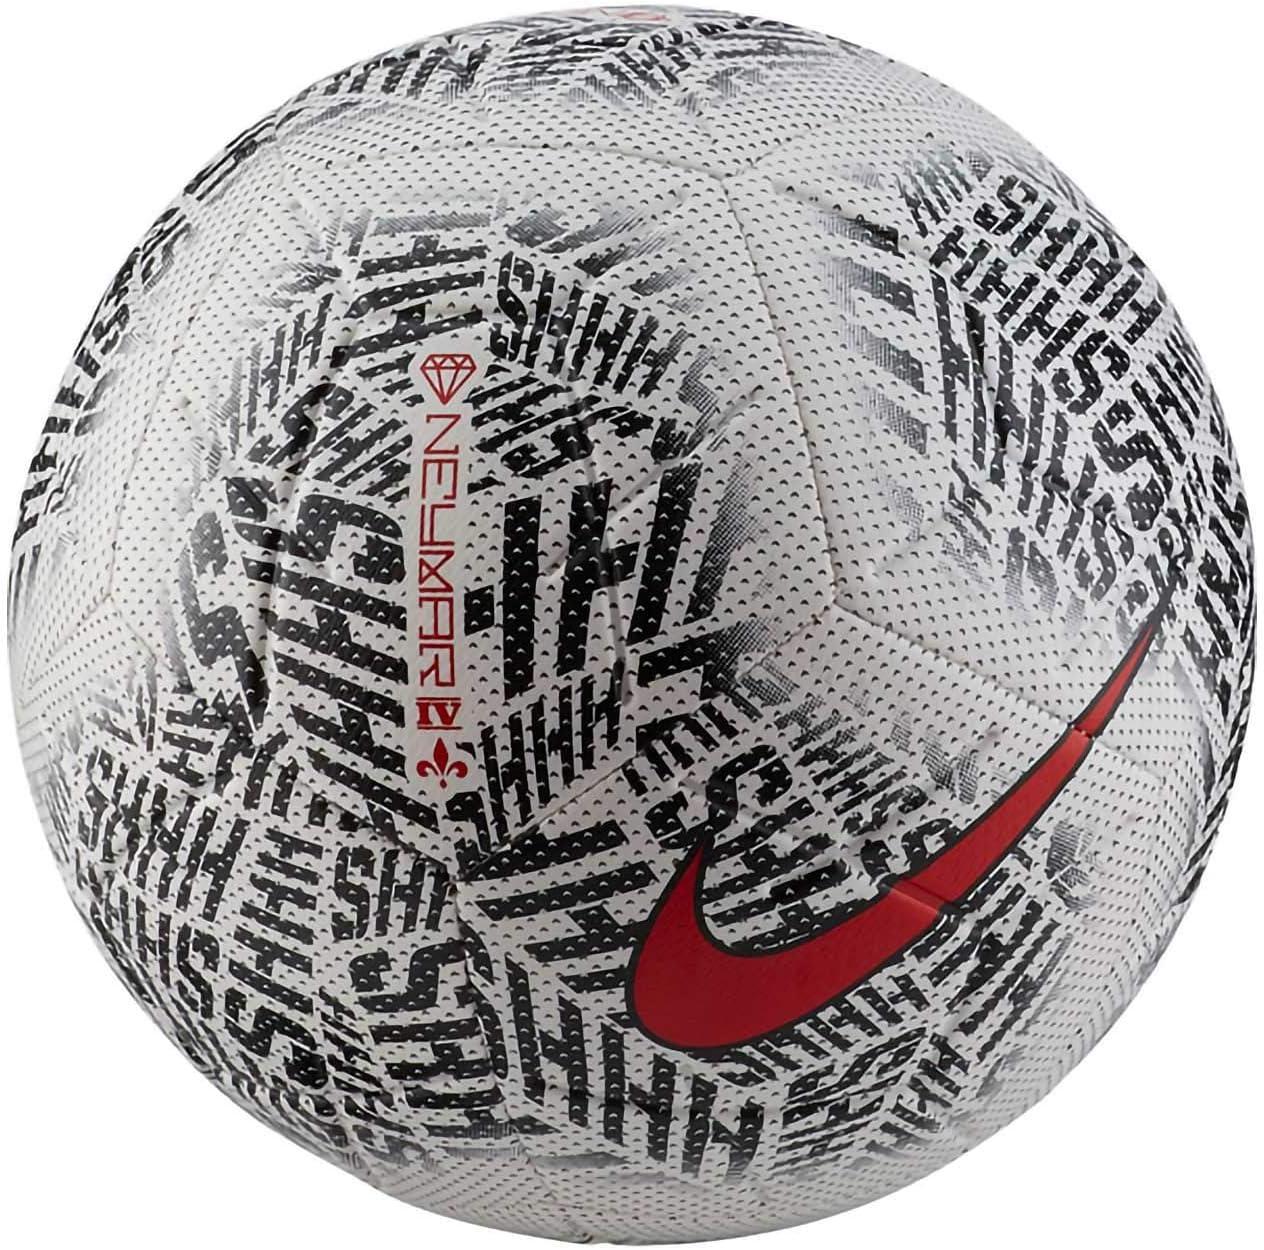 Nike NYMR NK Strk-New Balón de fútbol, Adultos Unisex, White/Black ...